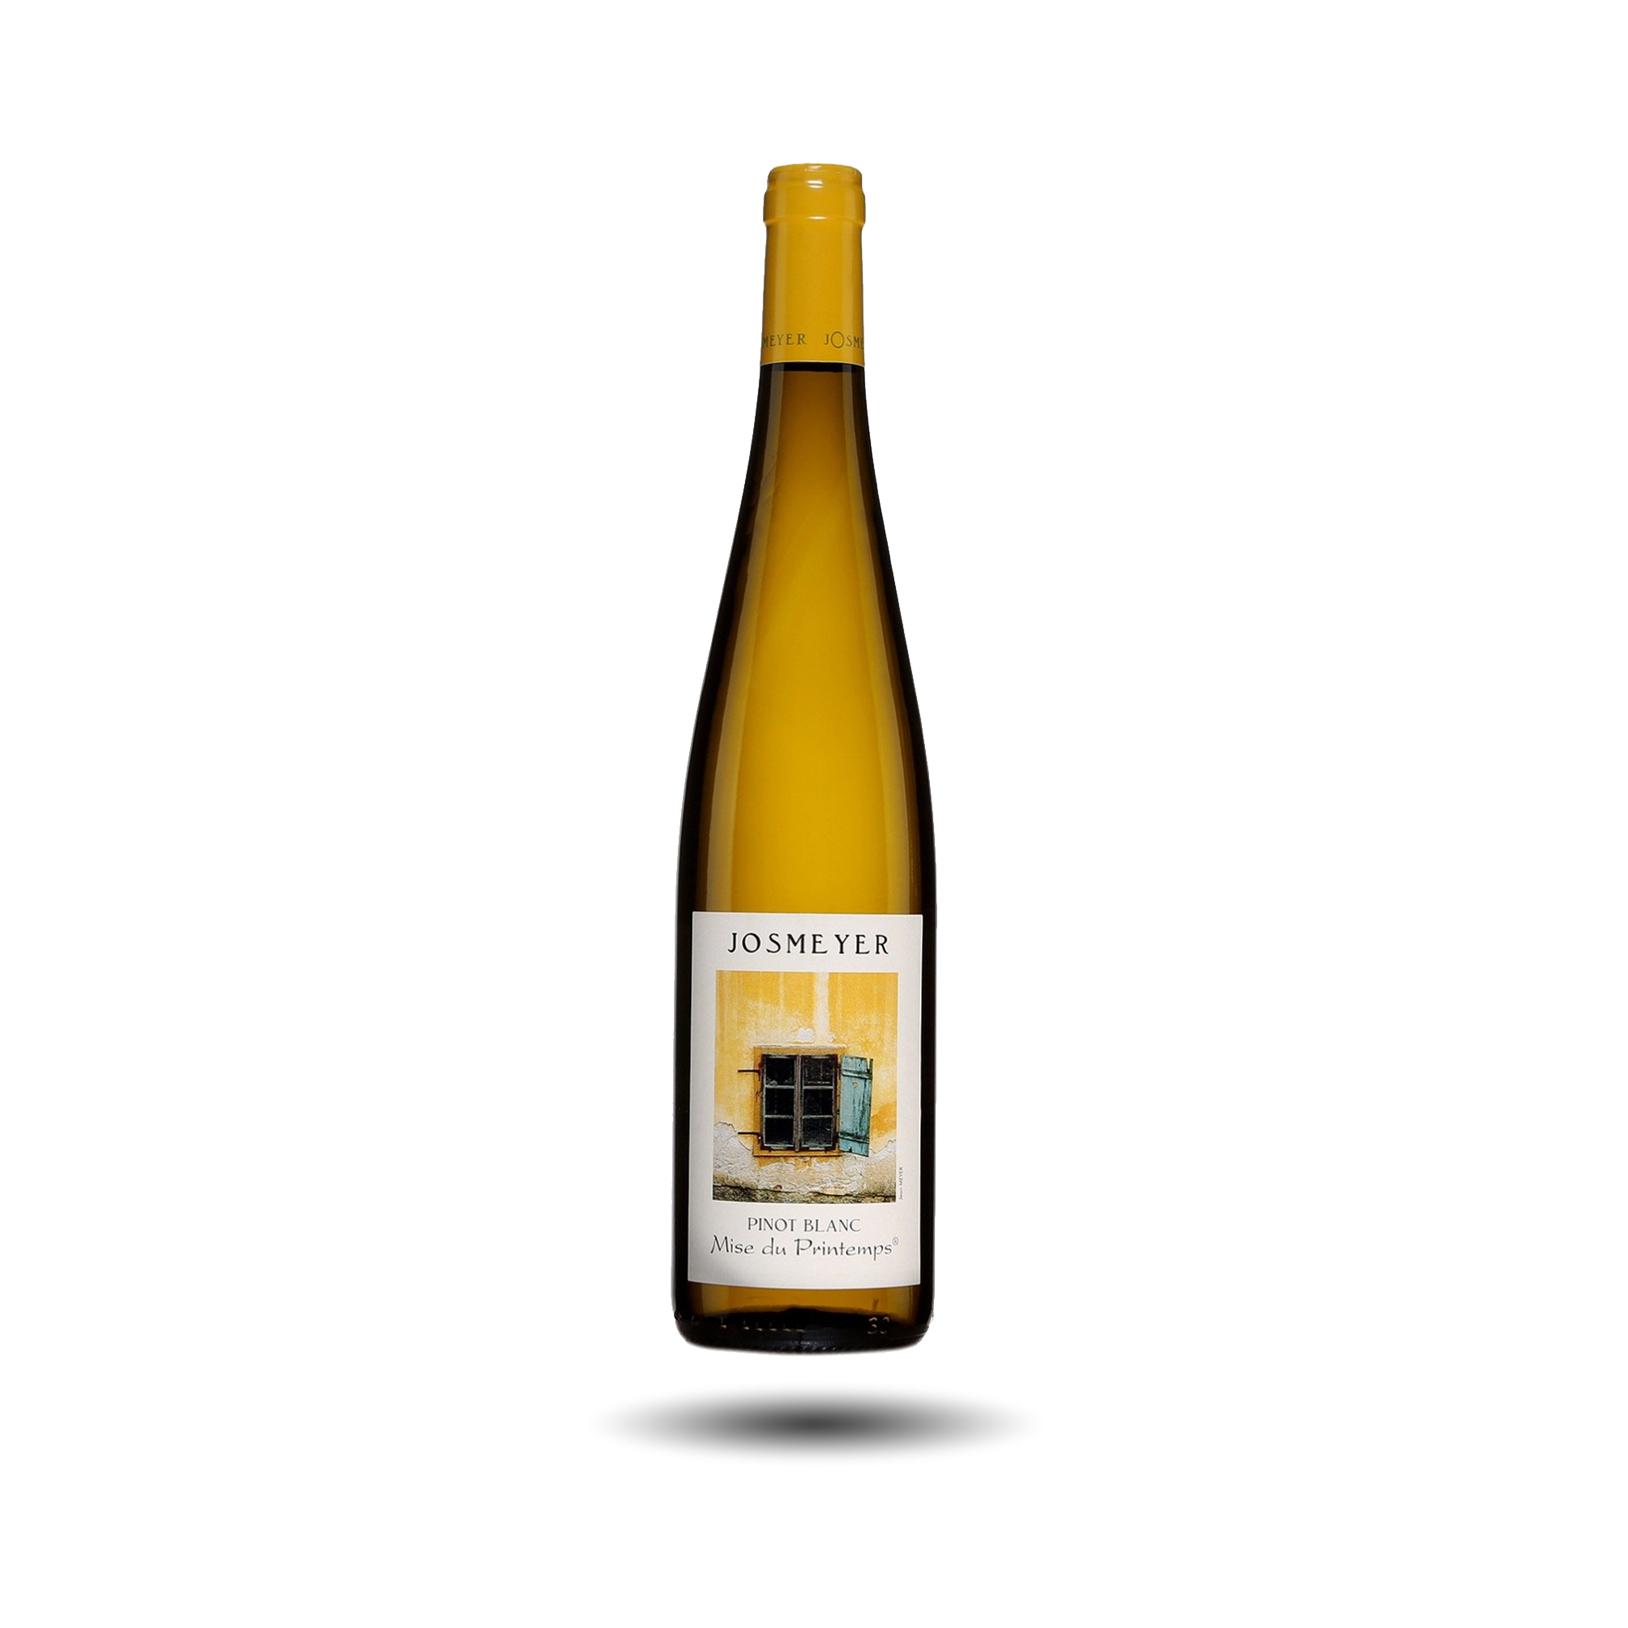 Alsace - Domaine Josmeyer, Mise du Printemps, Pinot Blanc, 2020